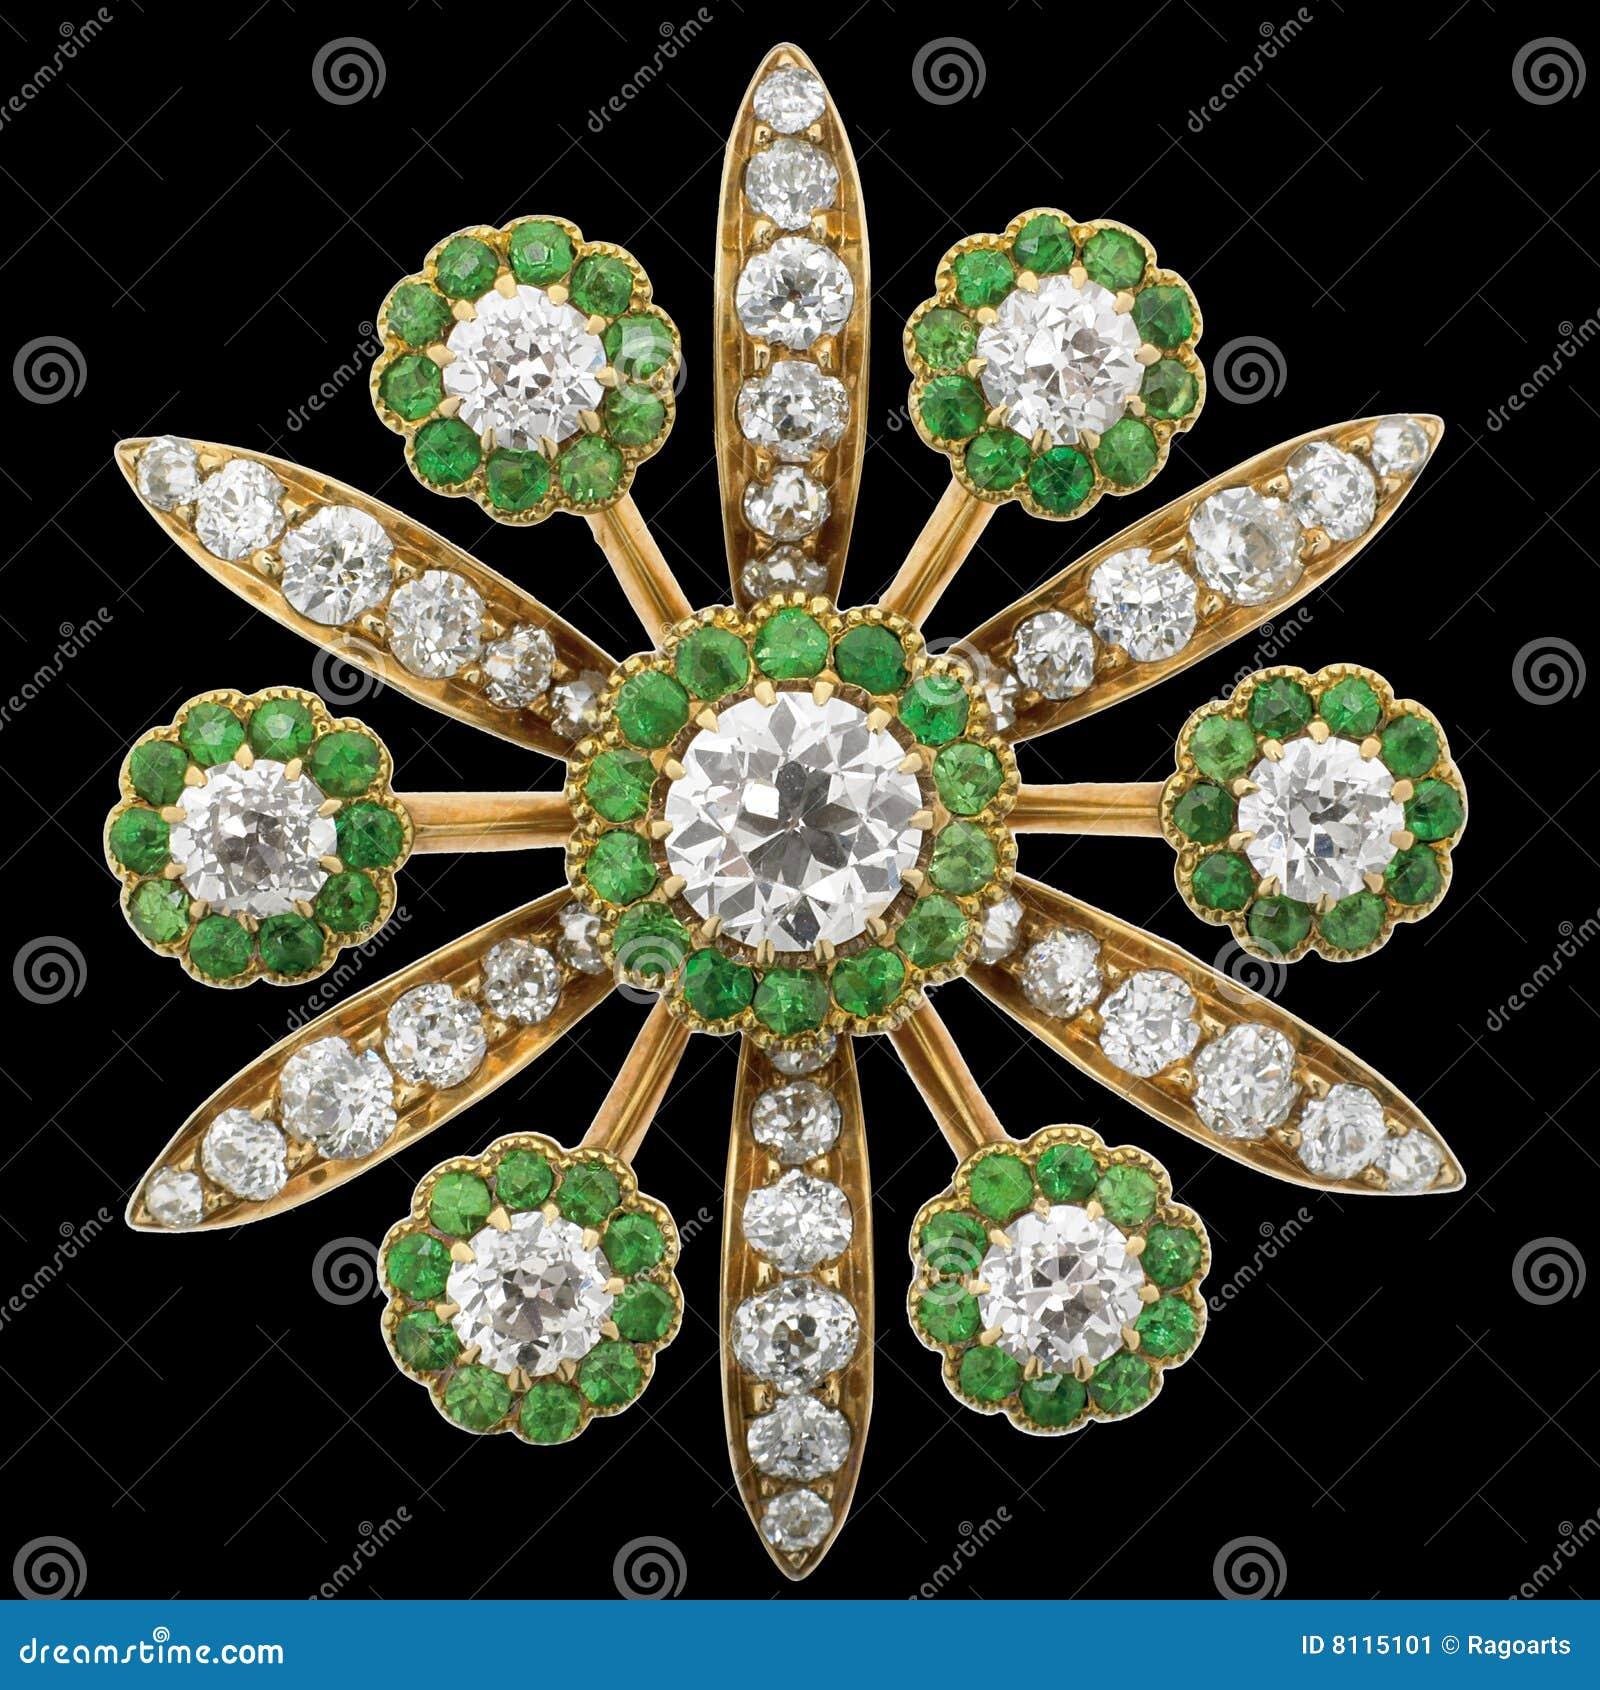 Brooch do diamante com esmeraldas